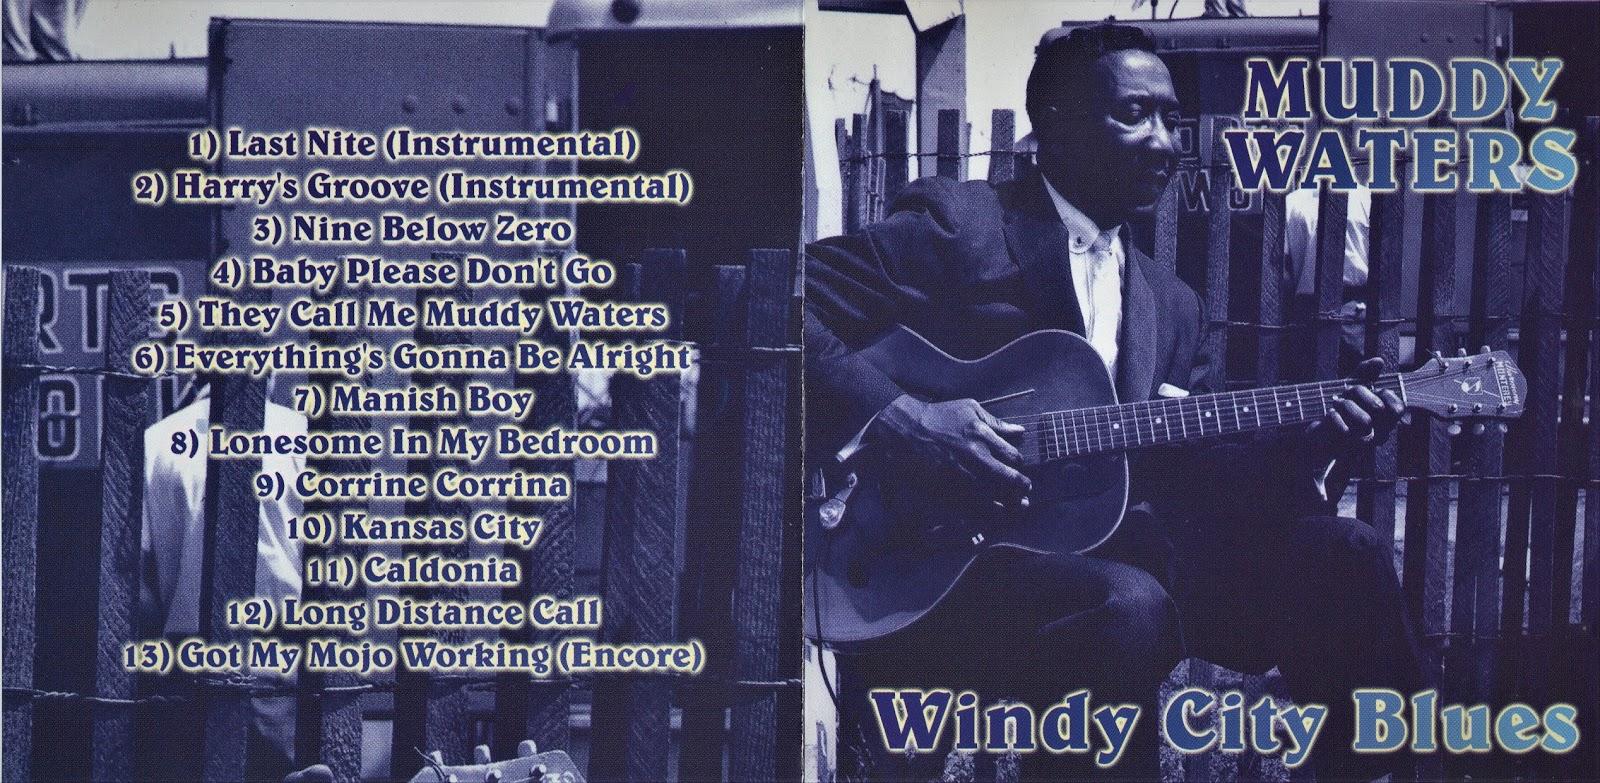 muddy waters top 10 albums